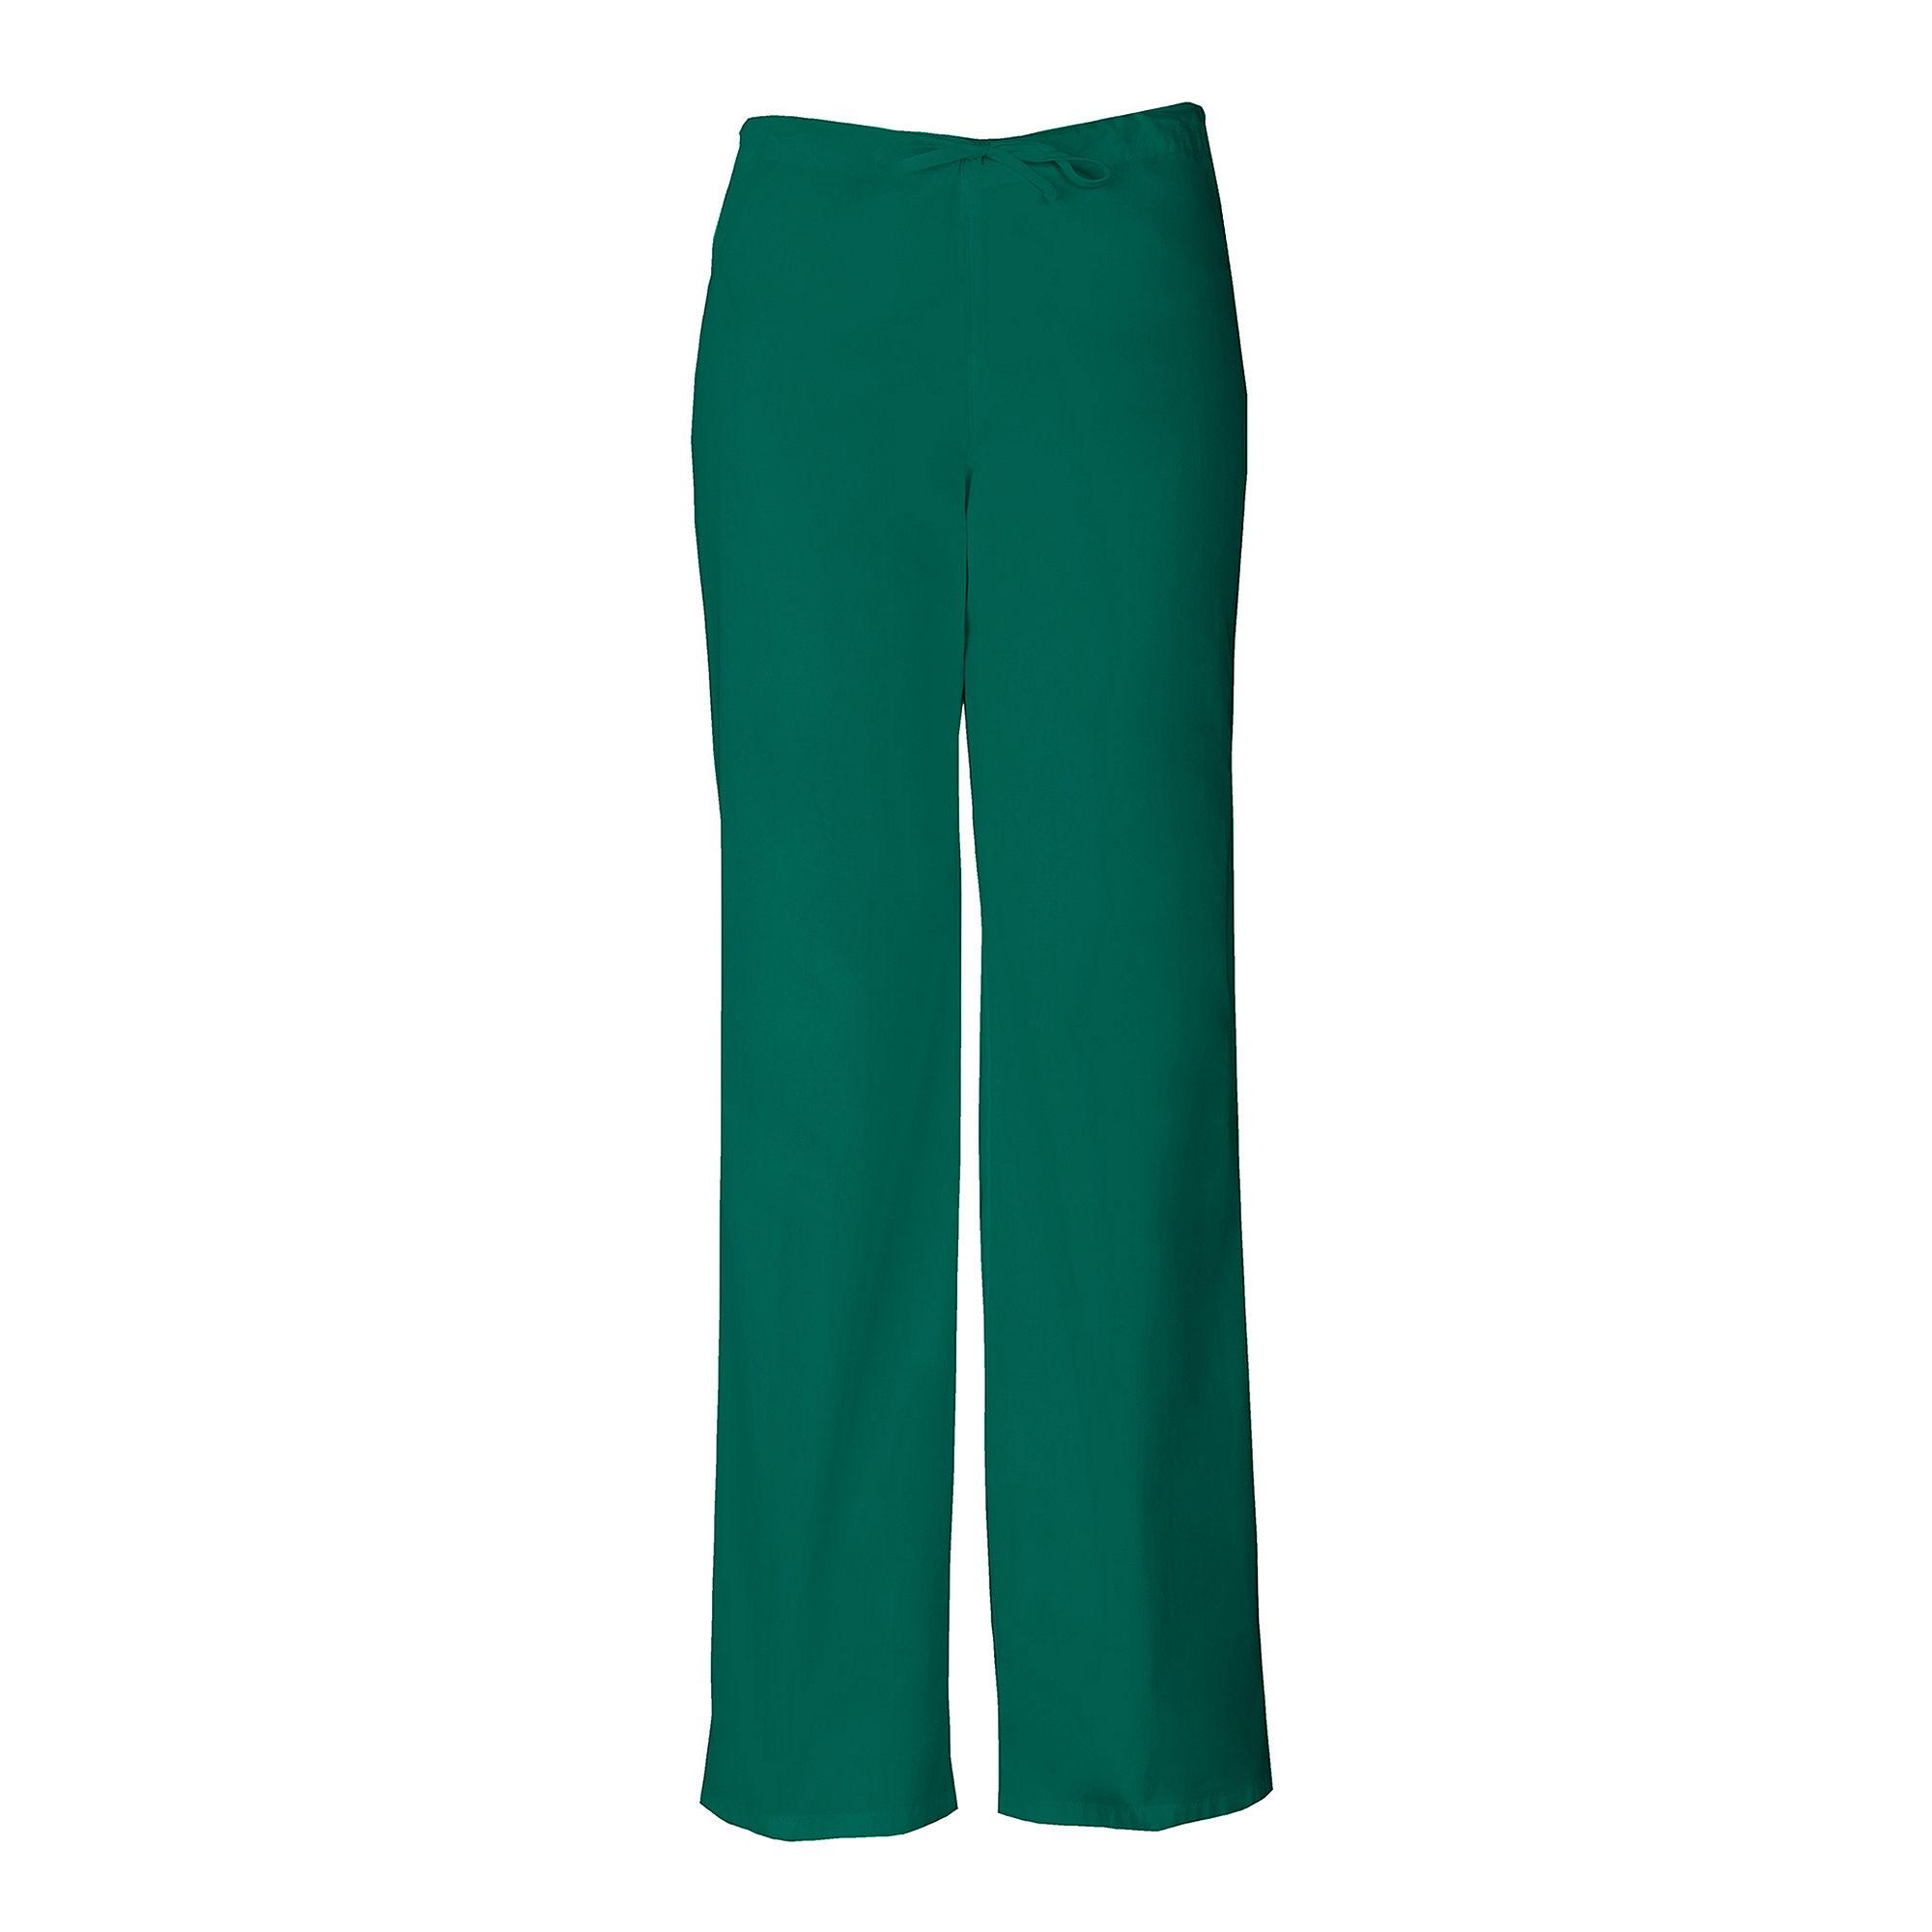 Dickies Unisex Cargo Scrub Pants-Plus